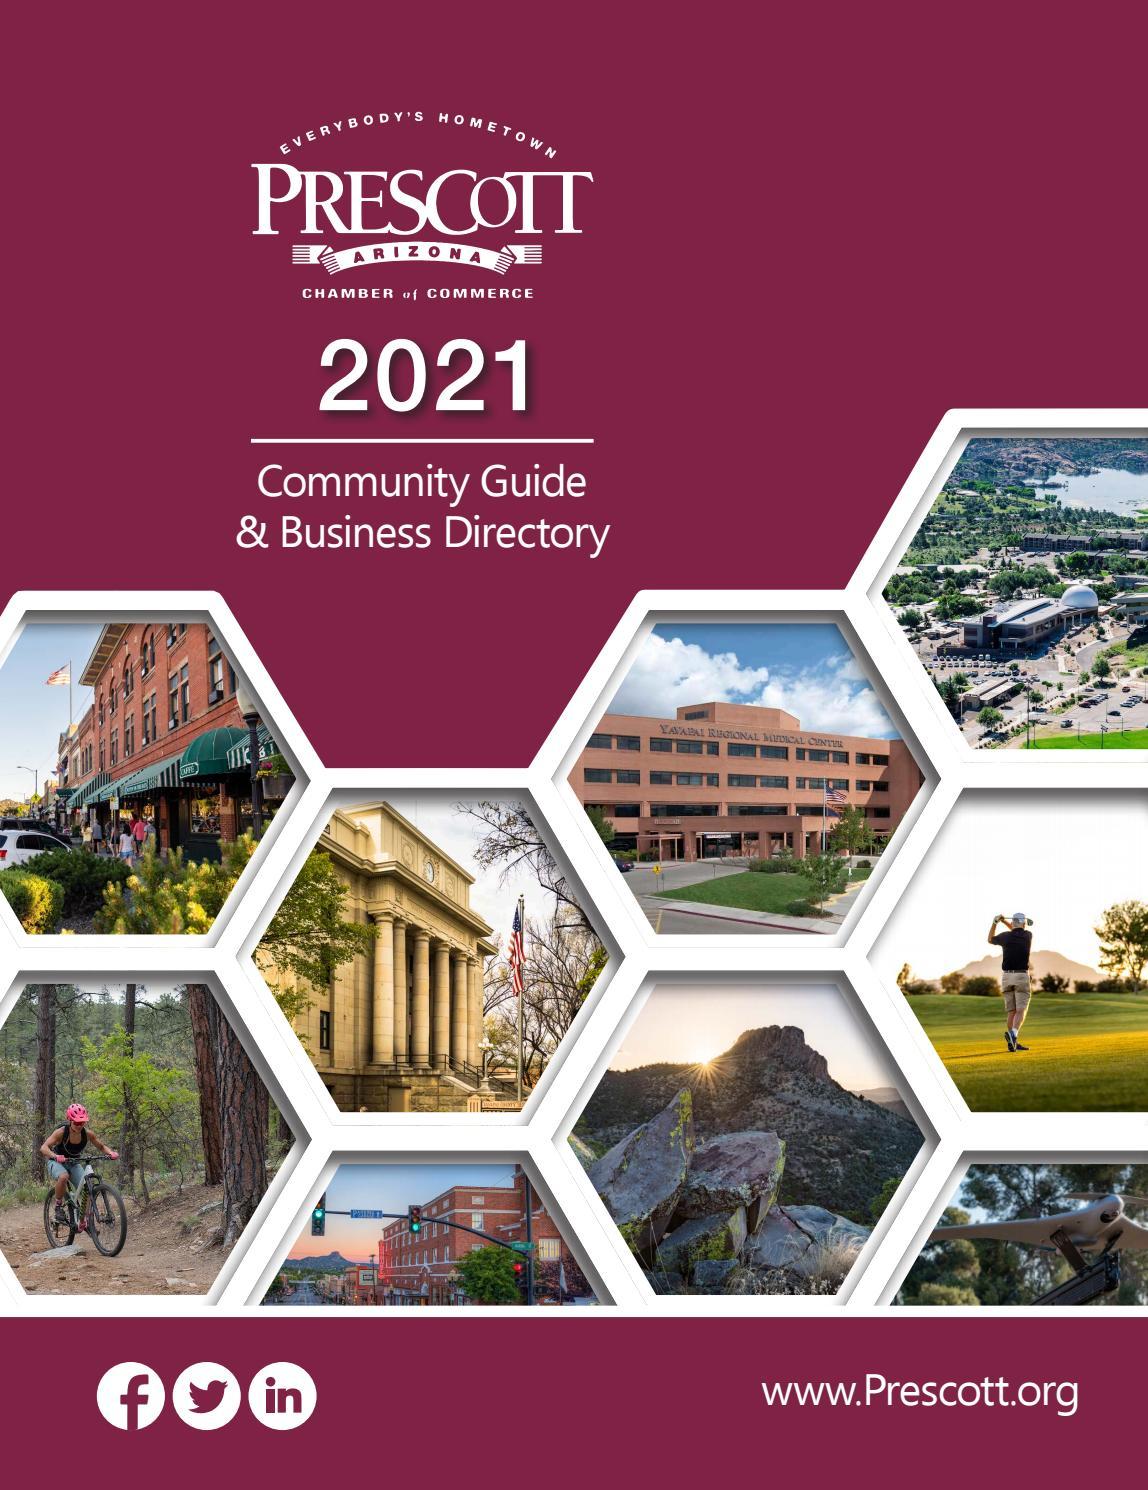 2021 Christmas Square Lighting Prescott Az City Of Prescott 2021 Community Guide Business Directory By Rox Media Group Issuu